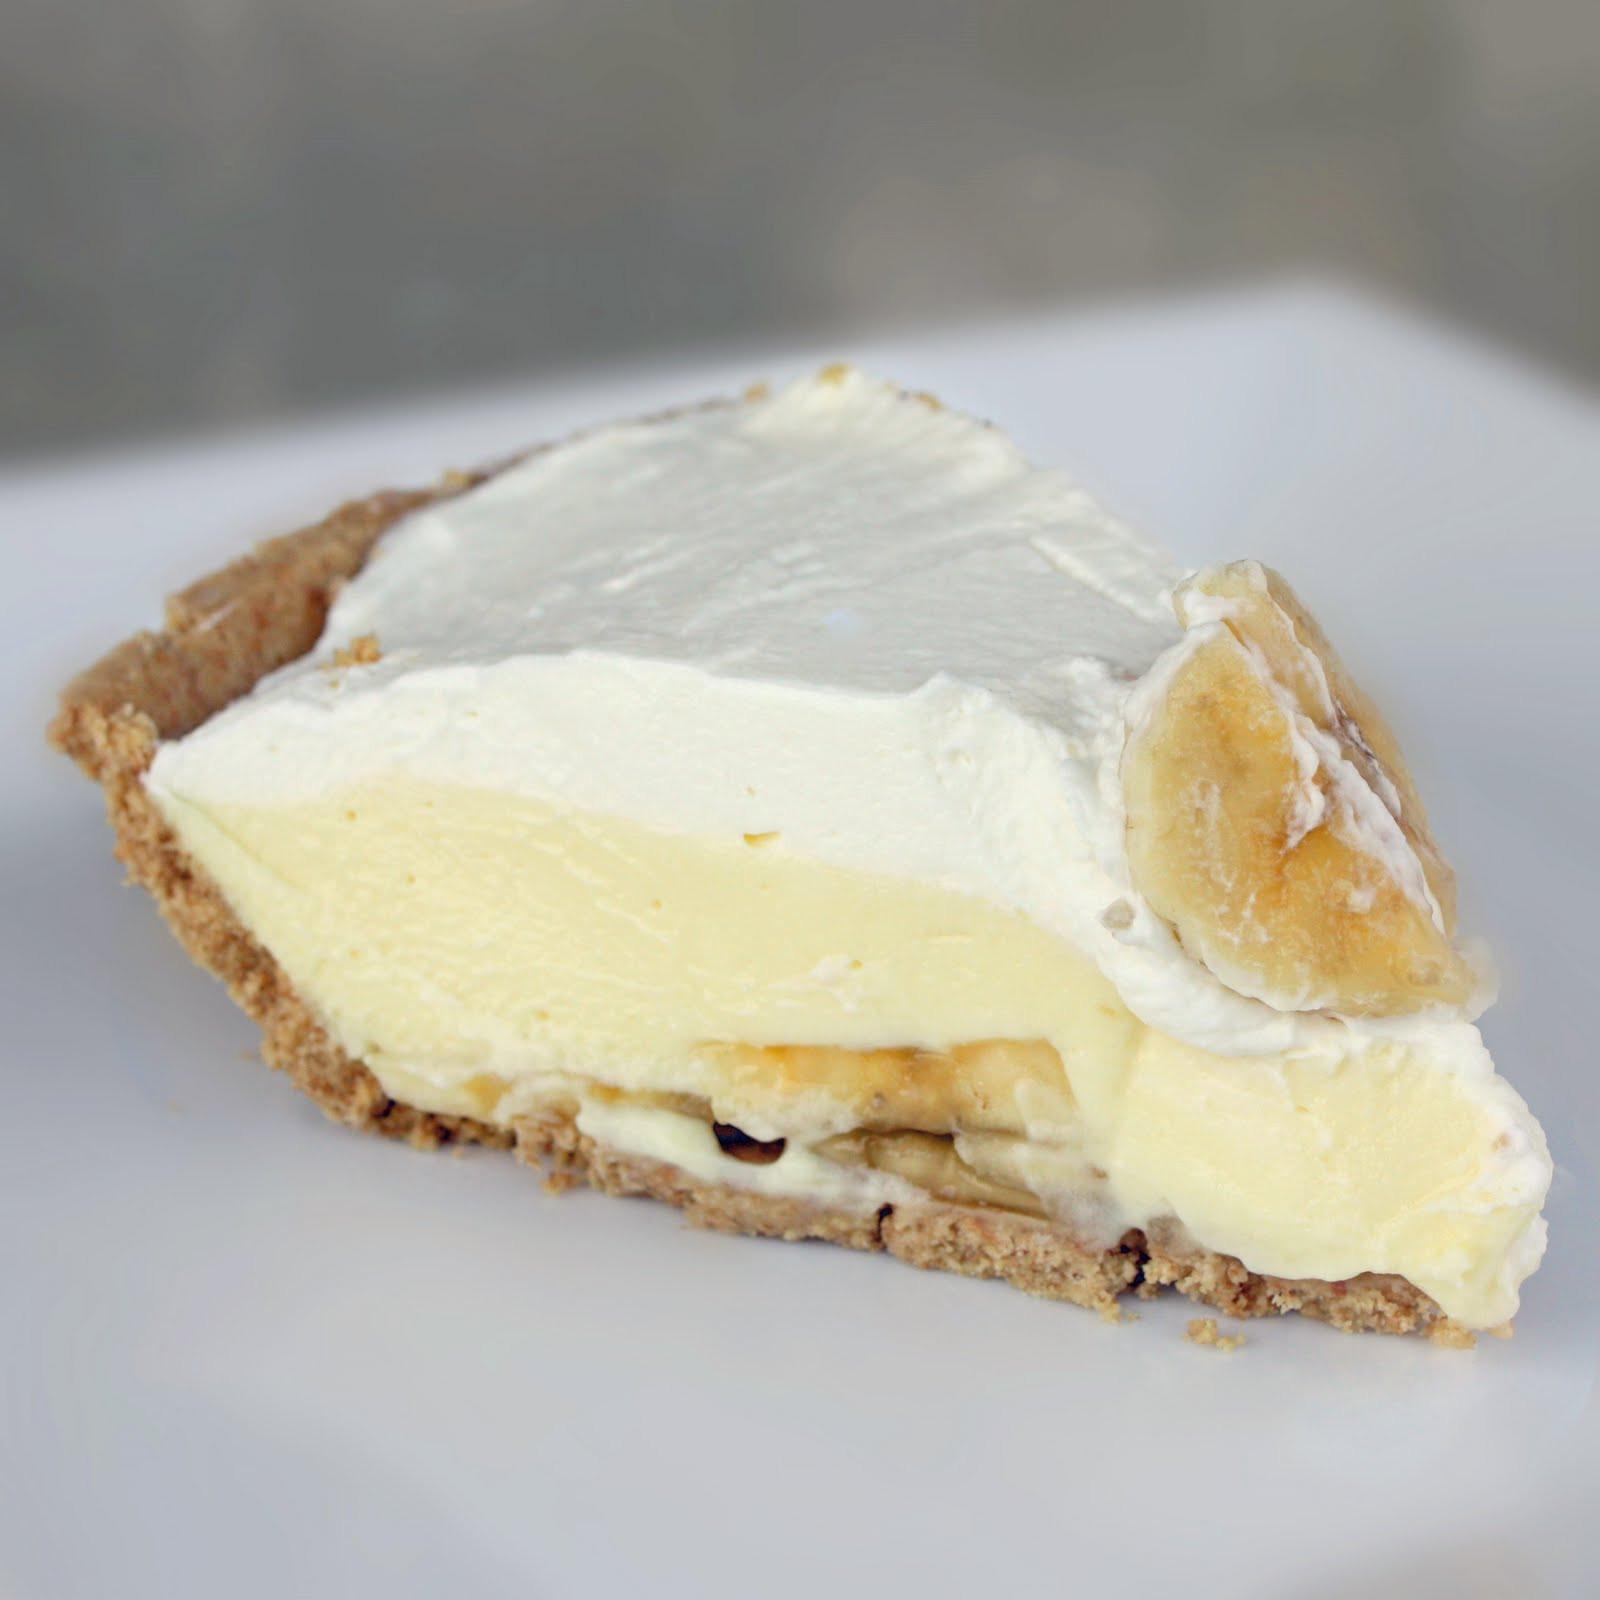 Banana Cream Pie  Banana Cream Pie the easy way The Girl Who Ate Everything